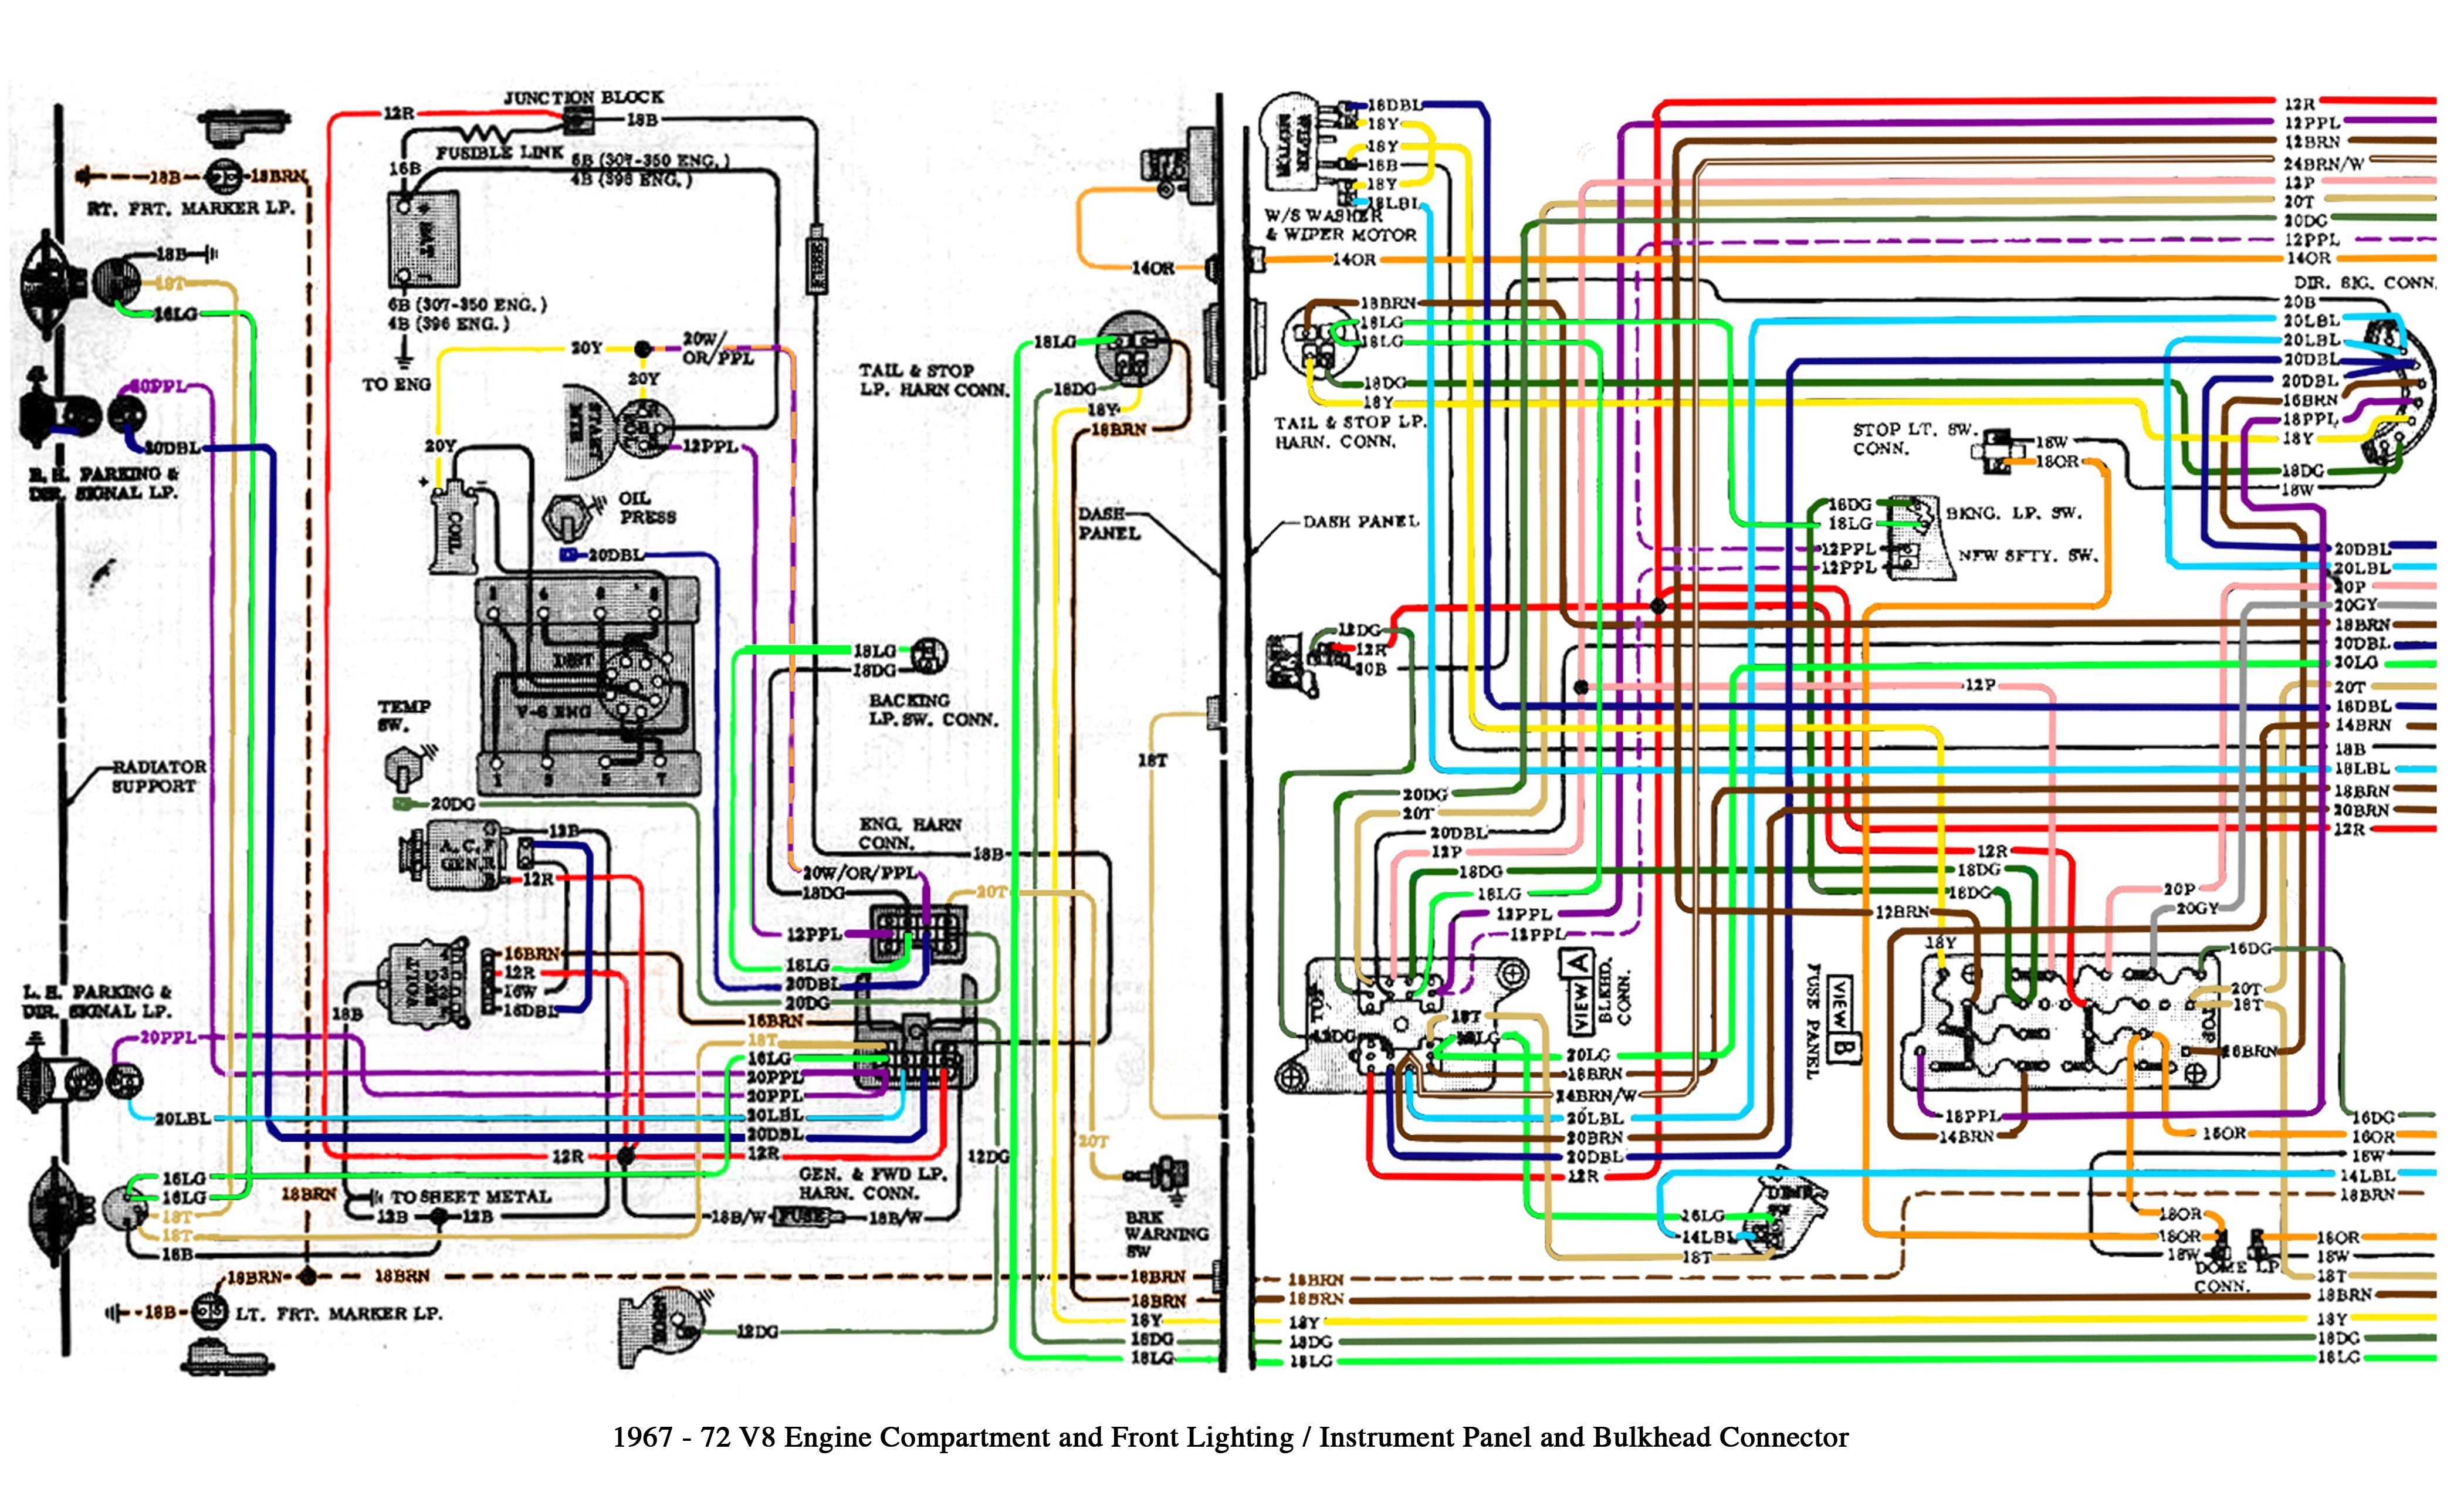 2003 Jetta Radio Wiring Diagram. 03 impala fuse panel ...